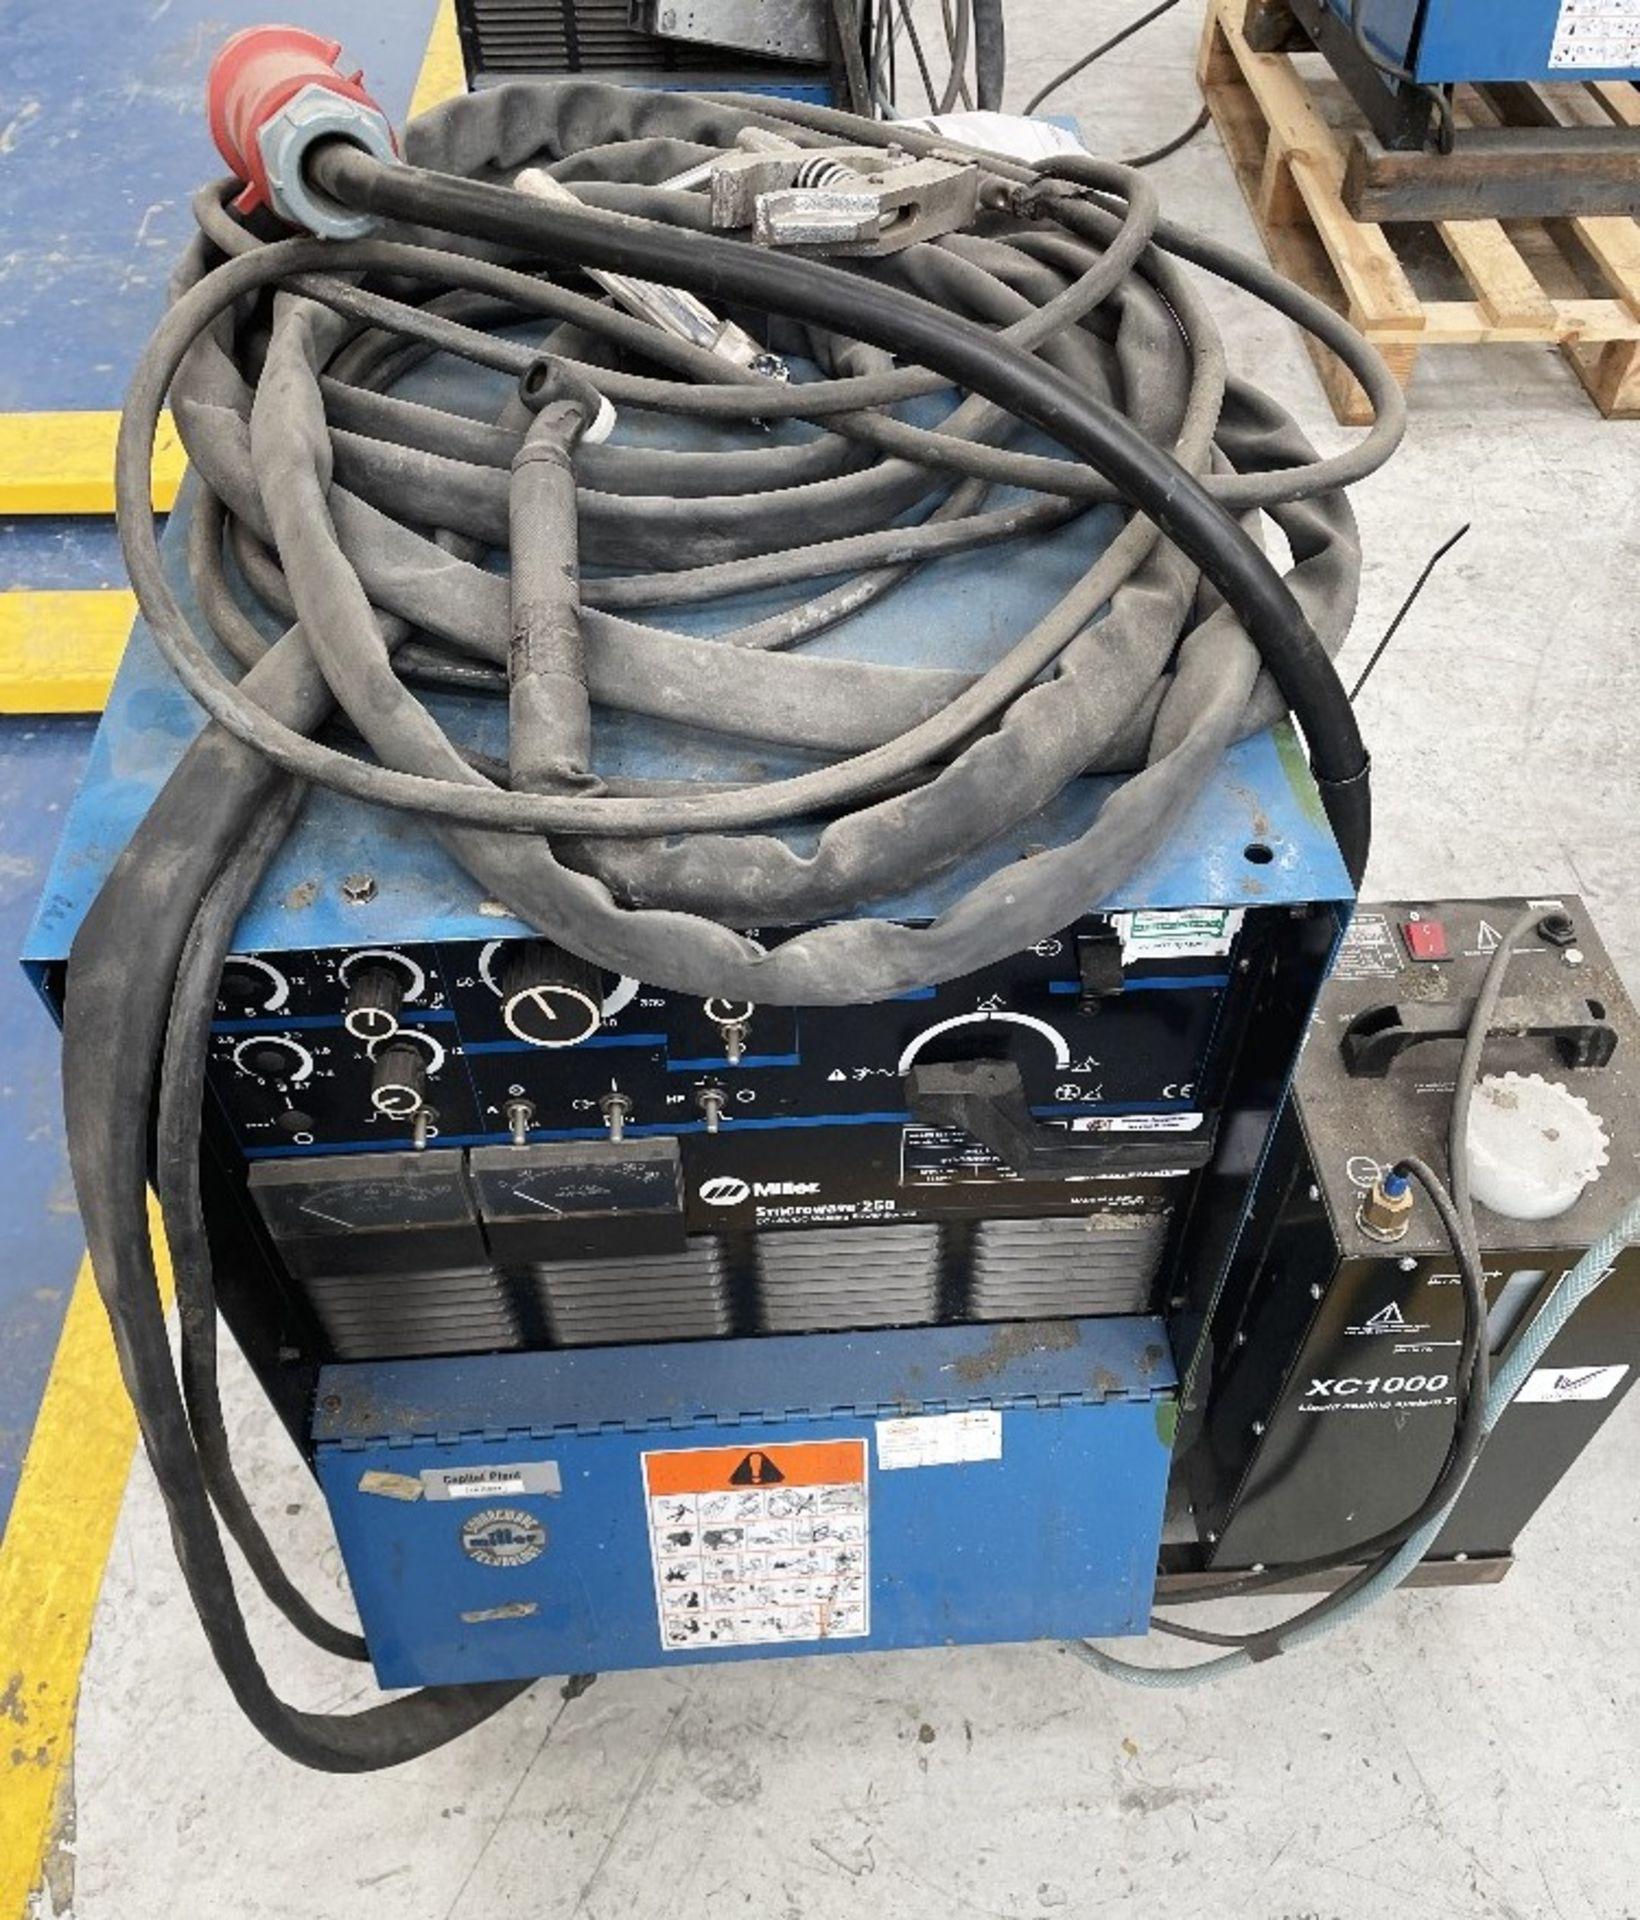 Miller Syncrowave 250 Tig Welder w/ TecArc XC1000 Water Cooler - Image 5 of 6